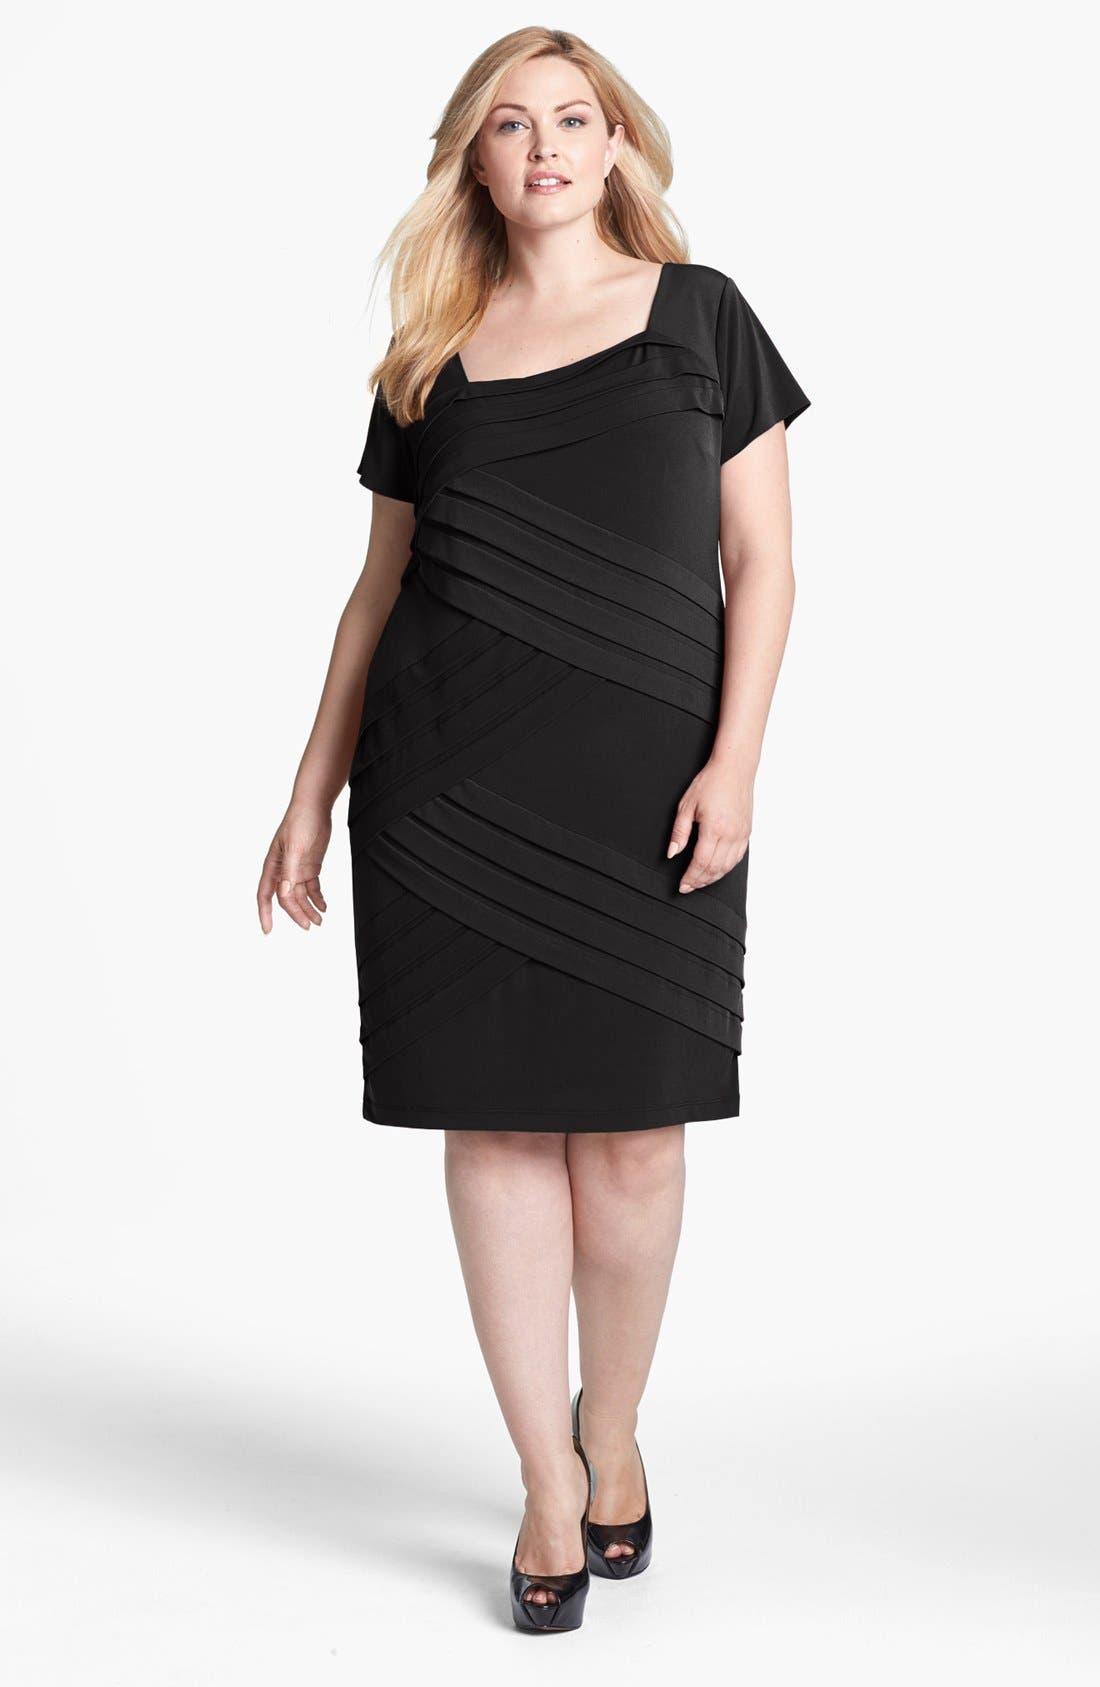 Alternate Image 1 Selected - London Times Shutter Pleat Sheath Dress (Plus Size)